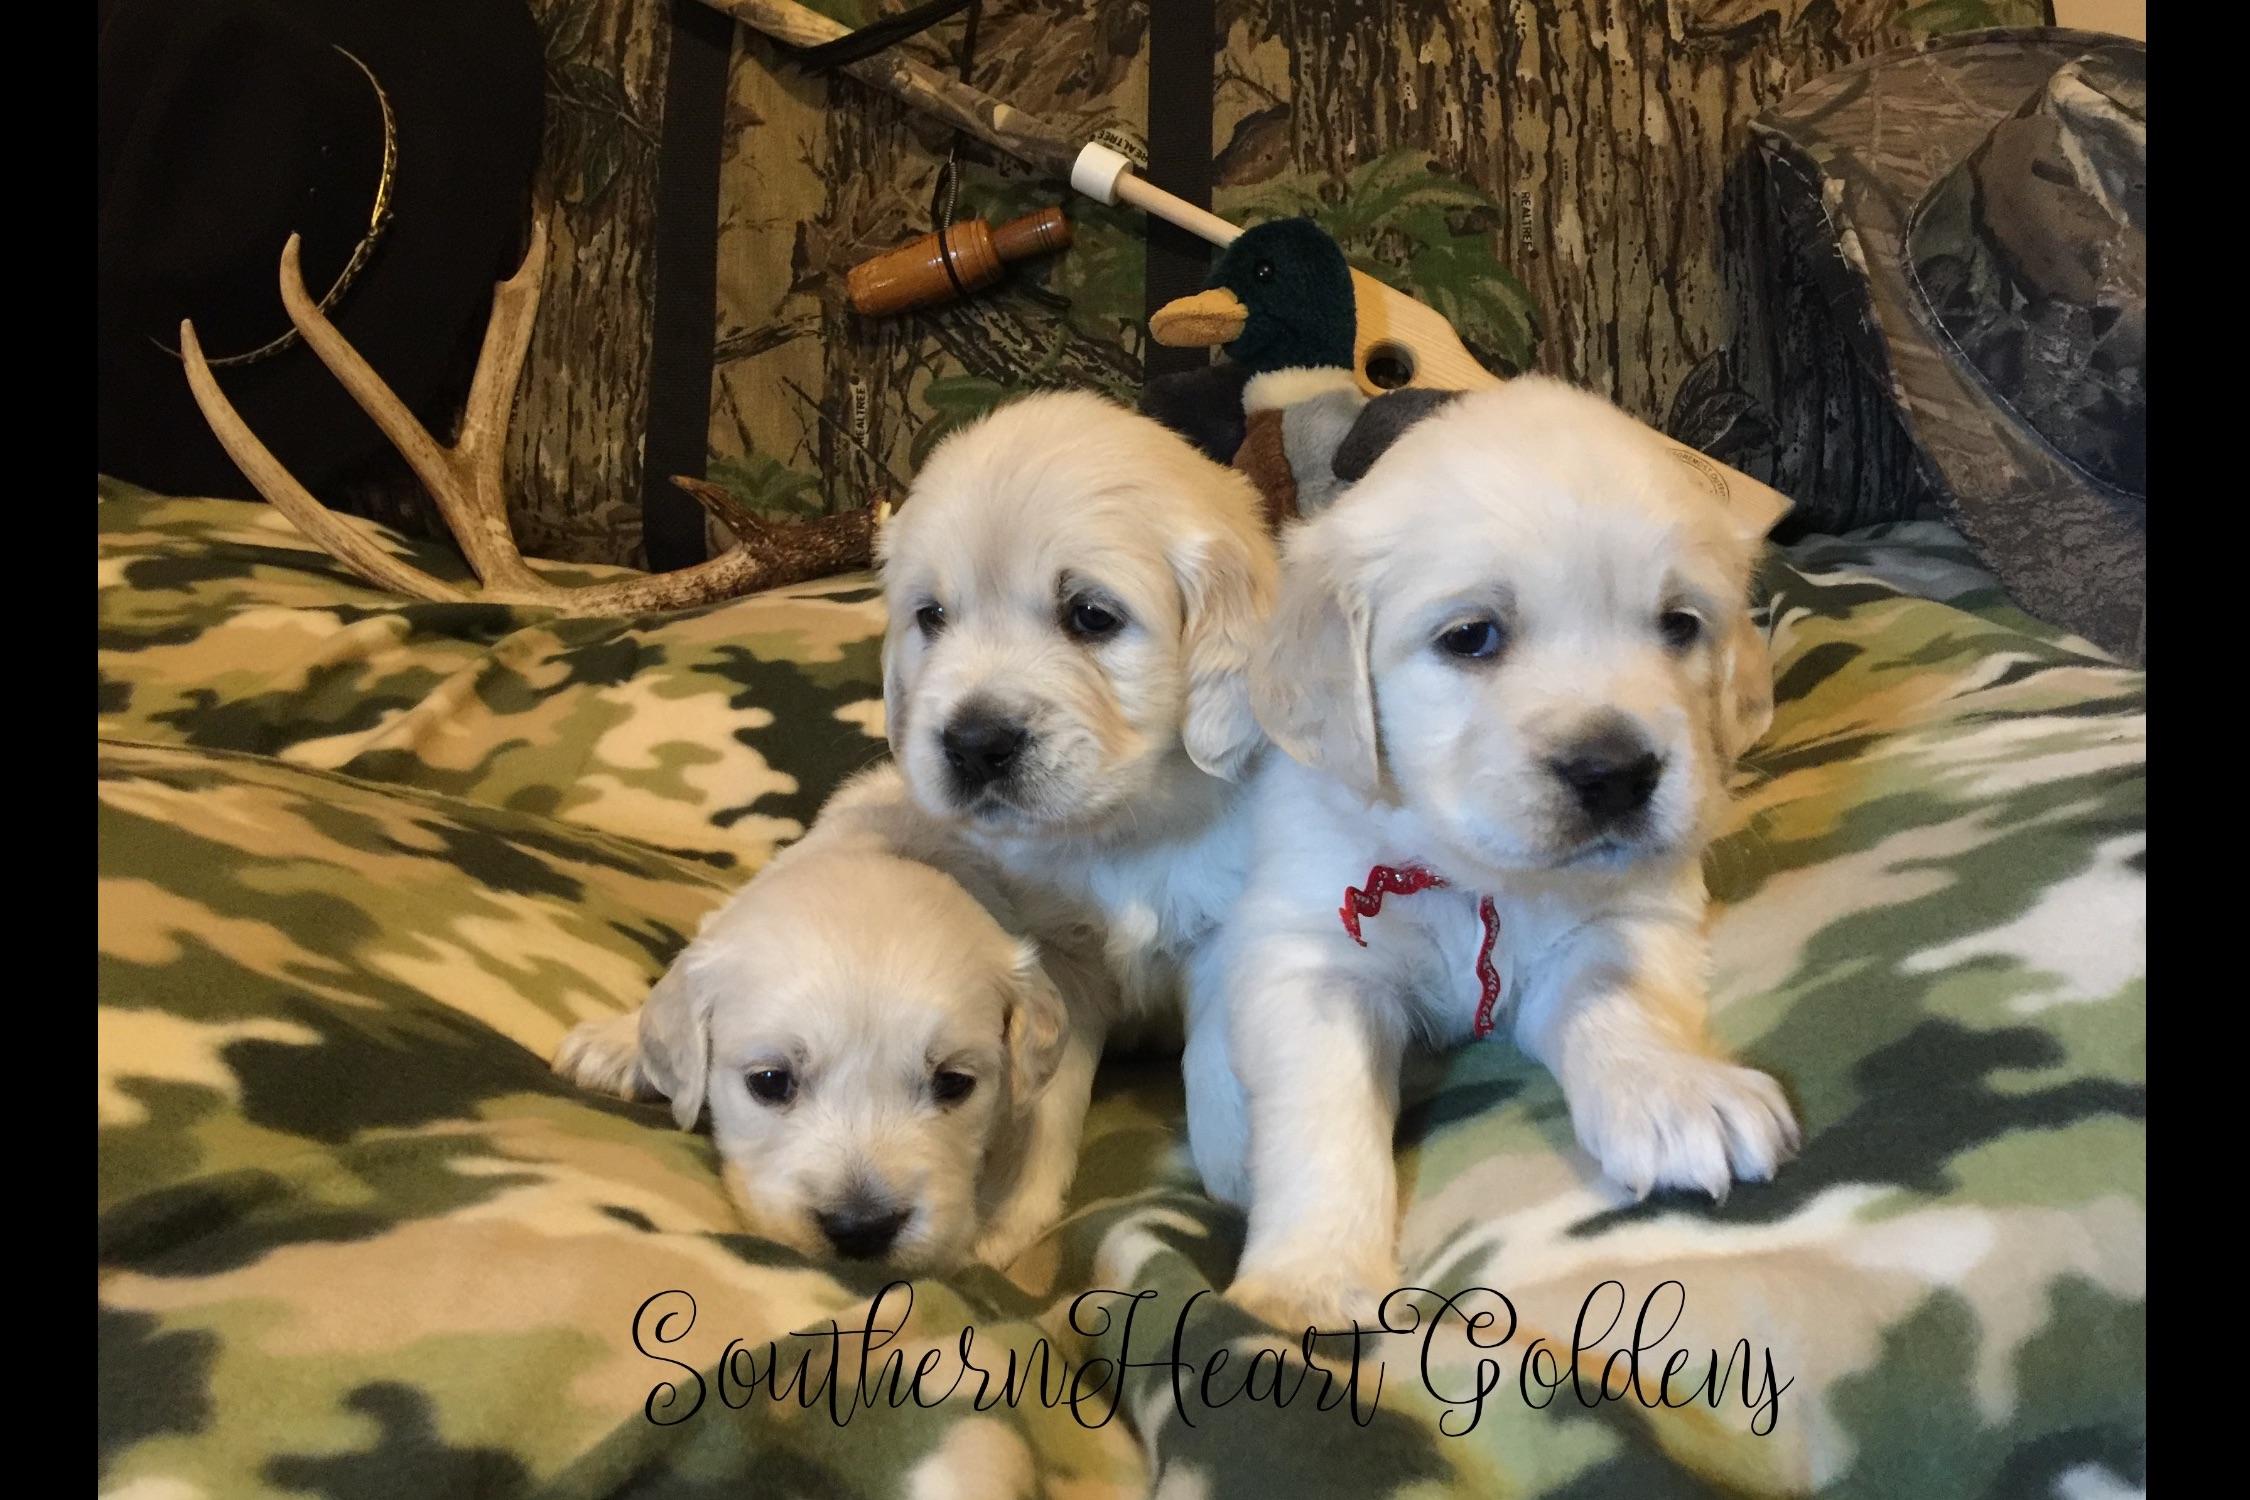 Southern Heart Goldens English Golden Retriever Puppies